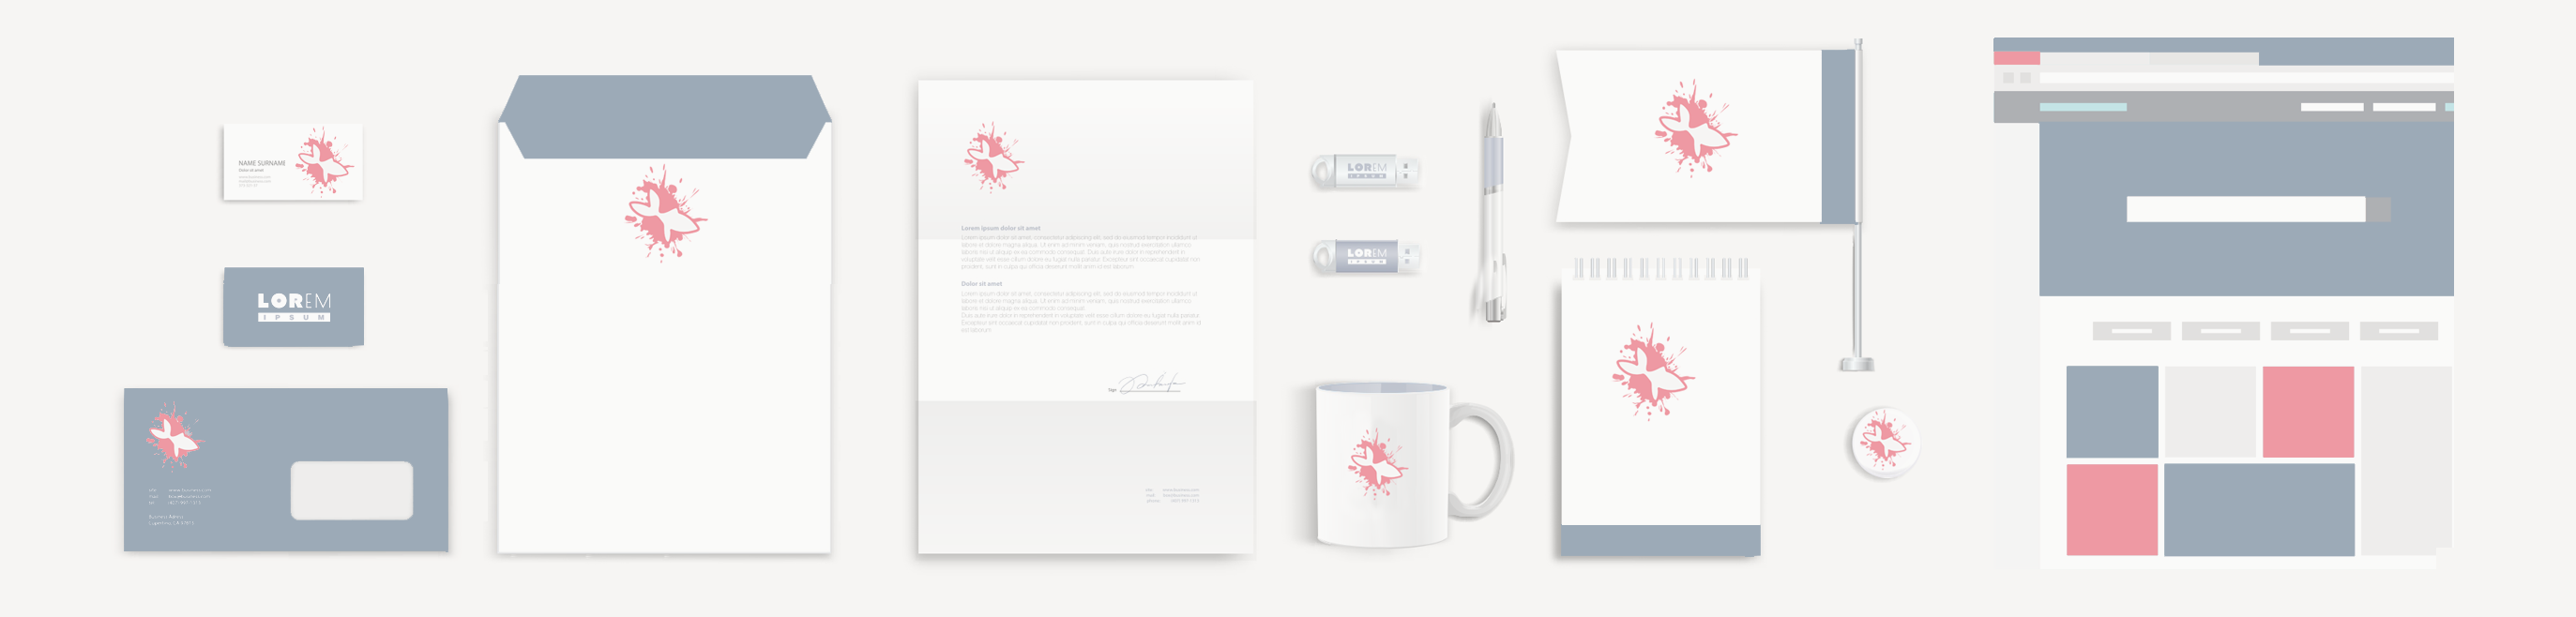 Graphic-Fish-betaalbare-vormgeving-webdesign-nes-friesland-slider